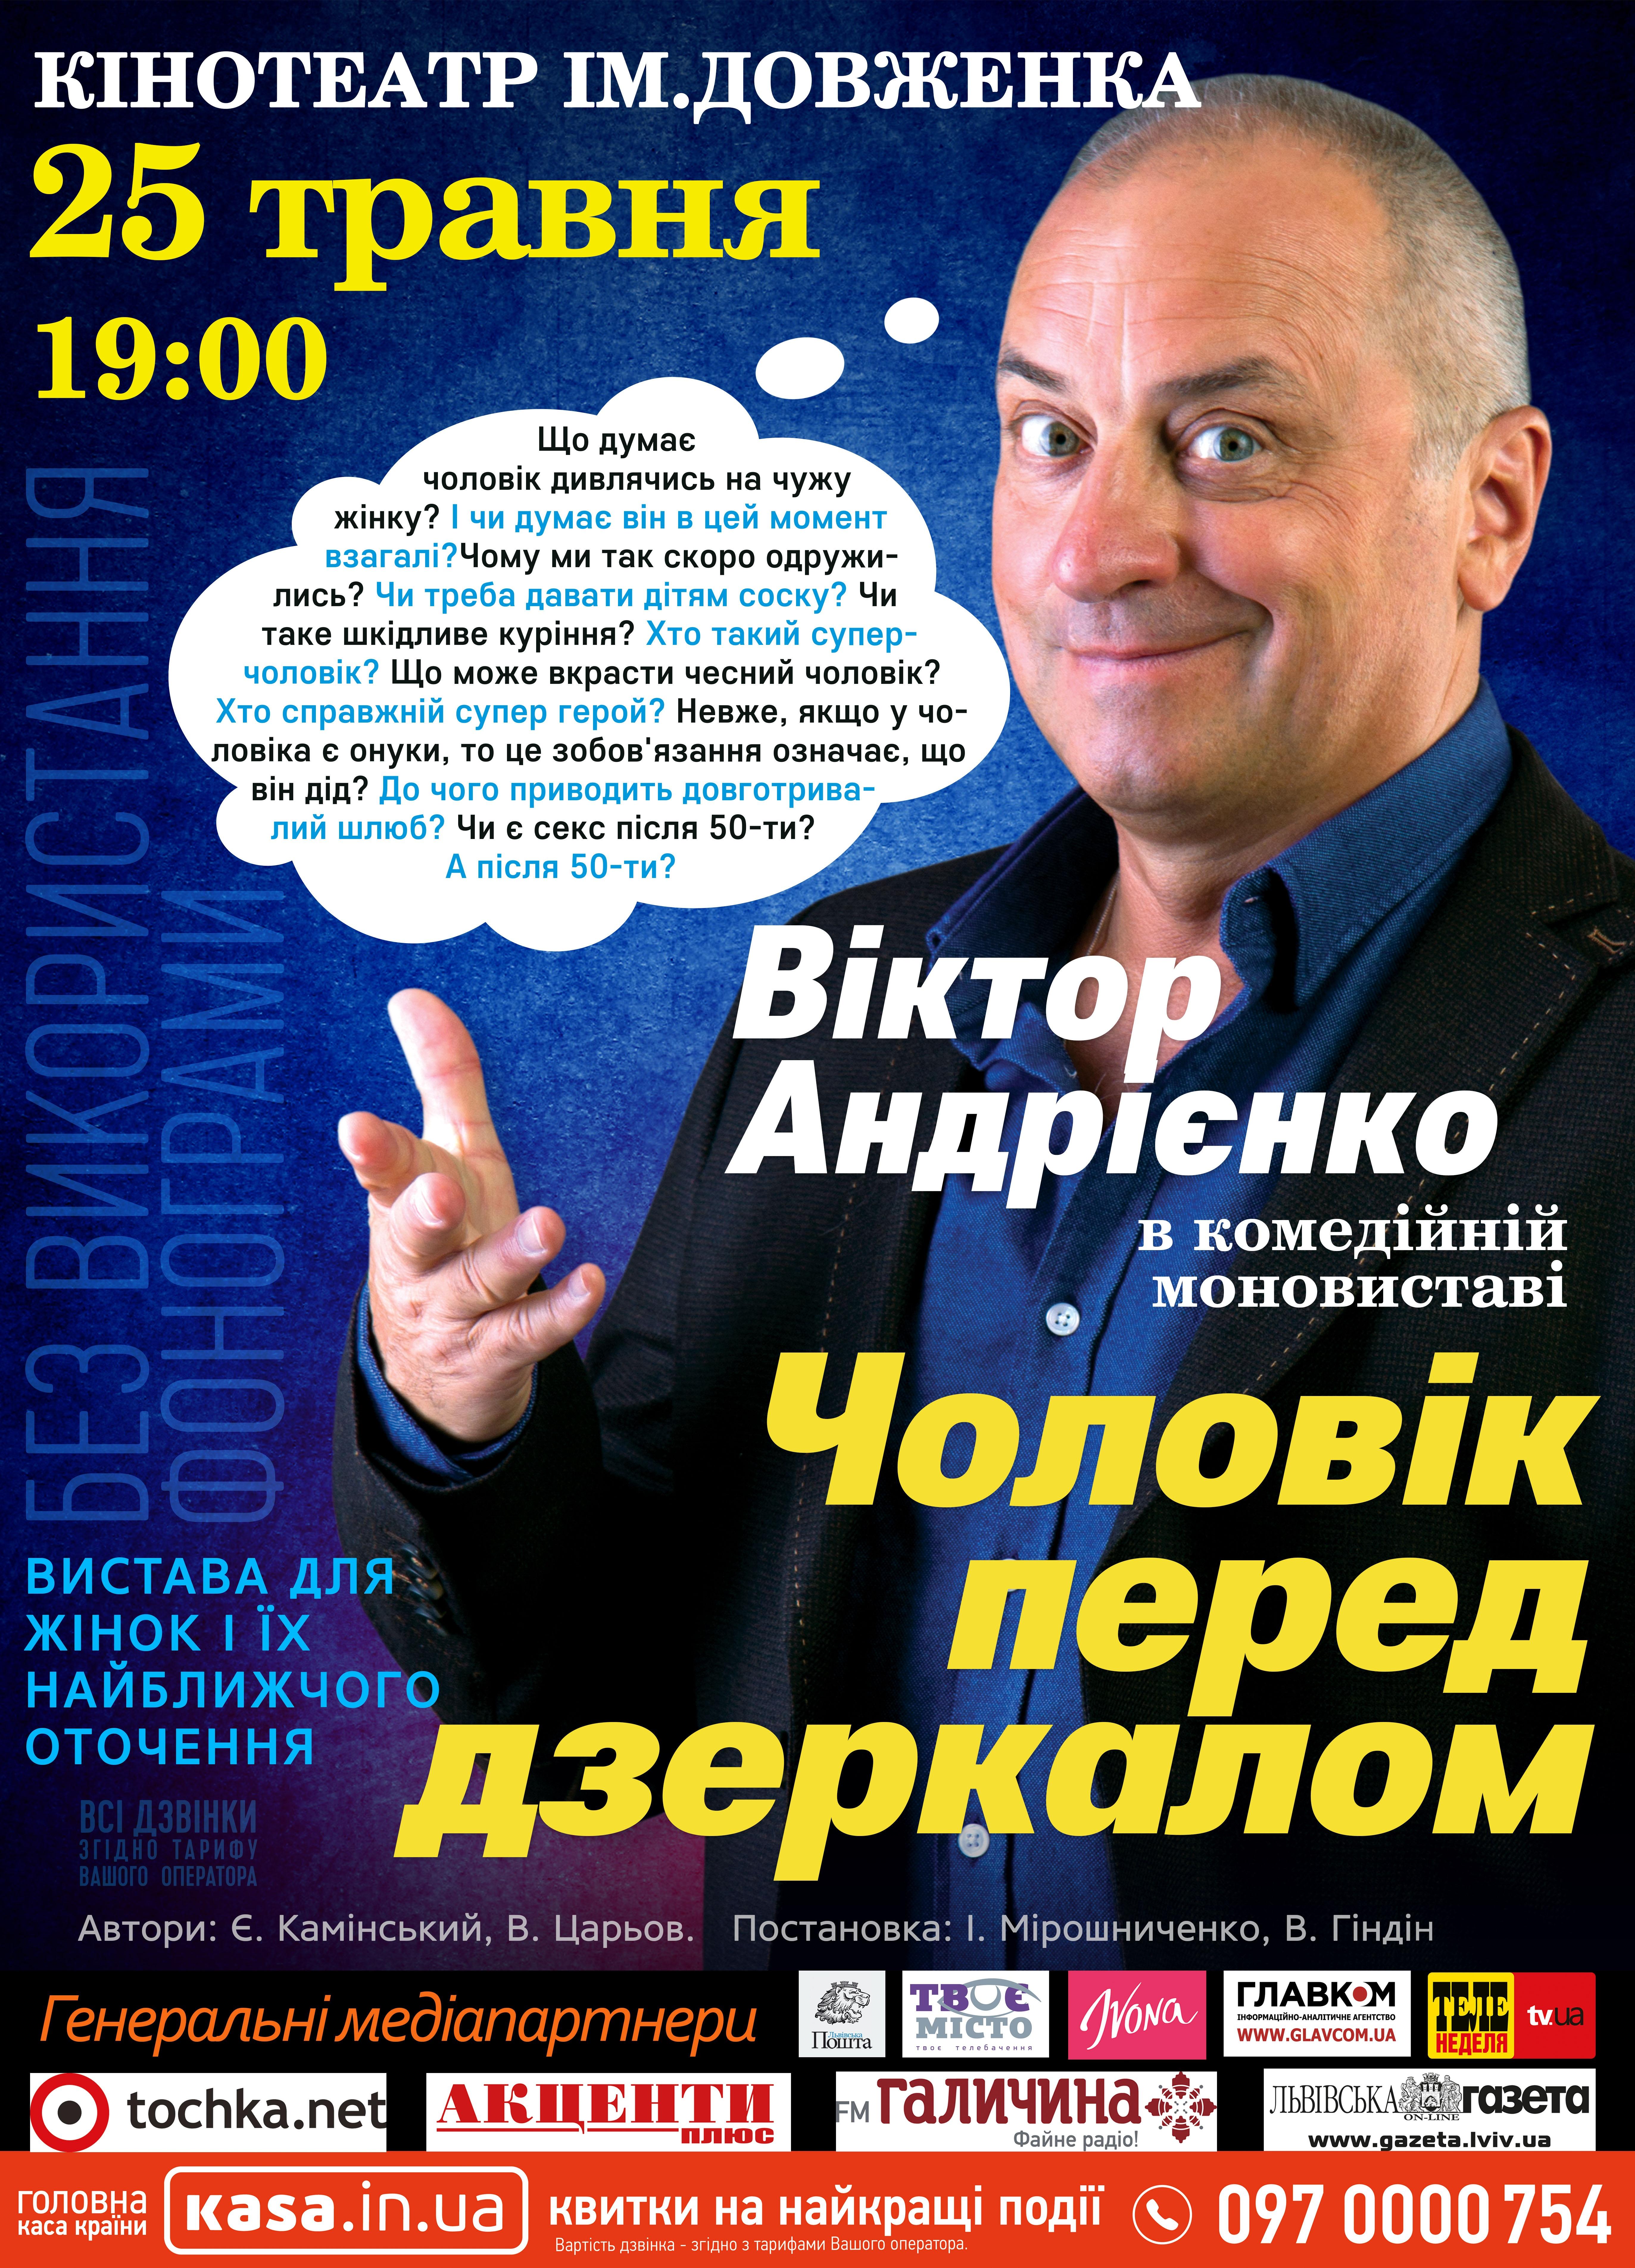 viktor-andrienko-priglashaet-na-monospektakl-cholovk-pered-dzerkalom_01